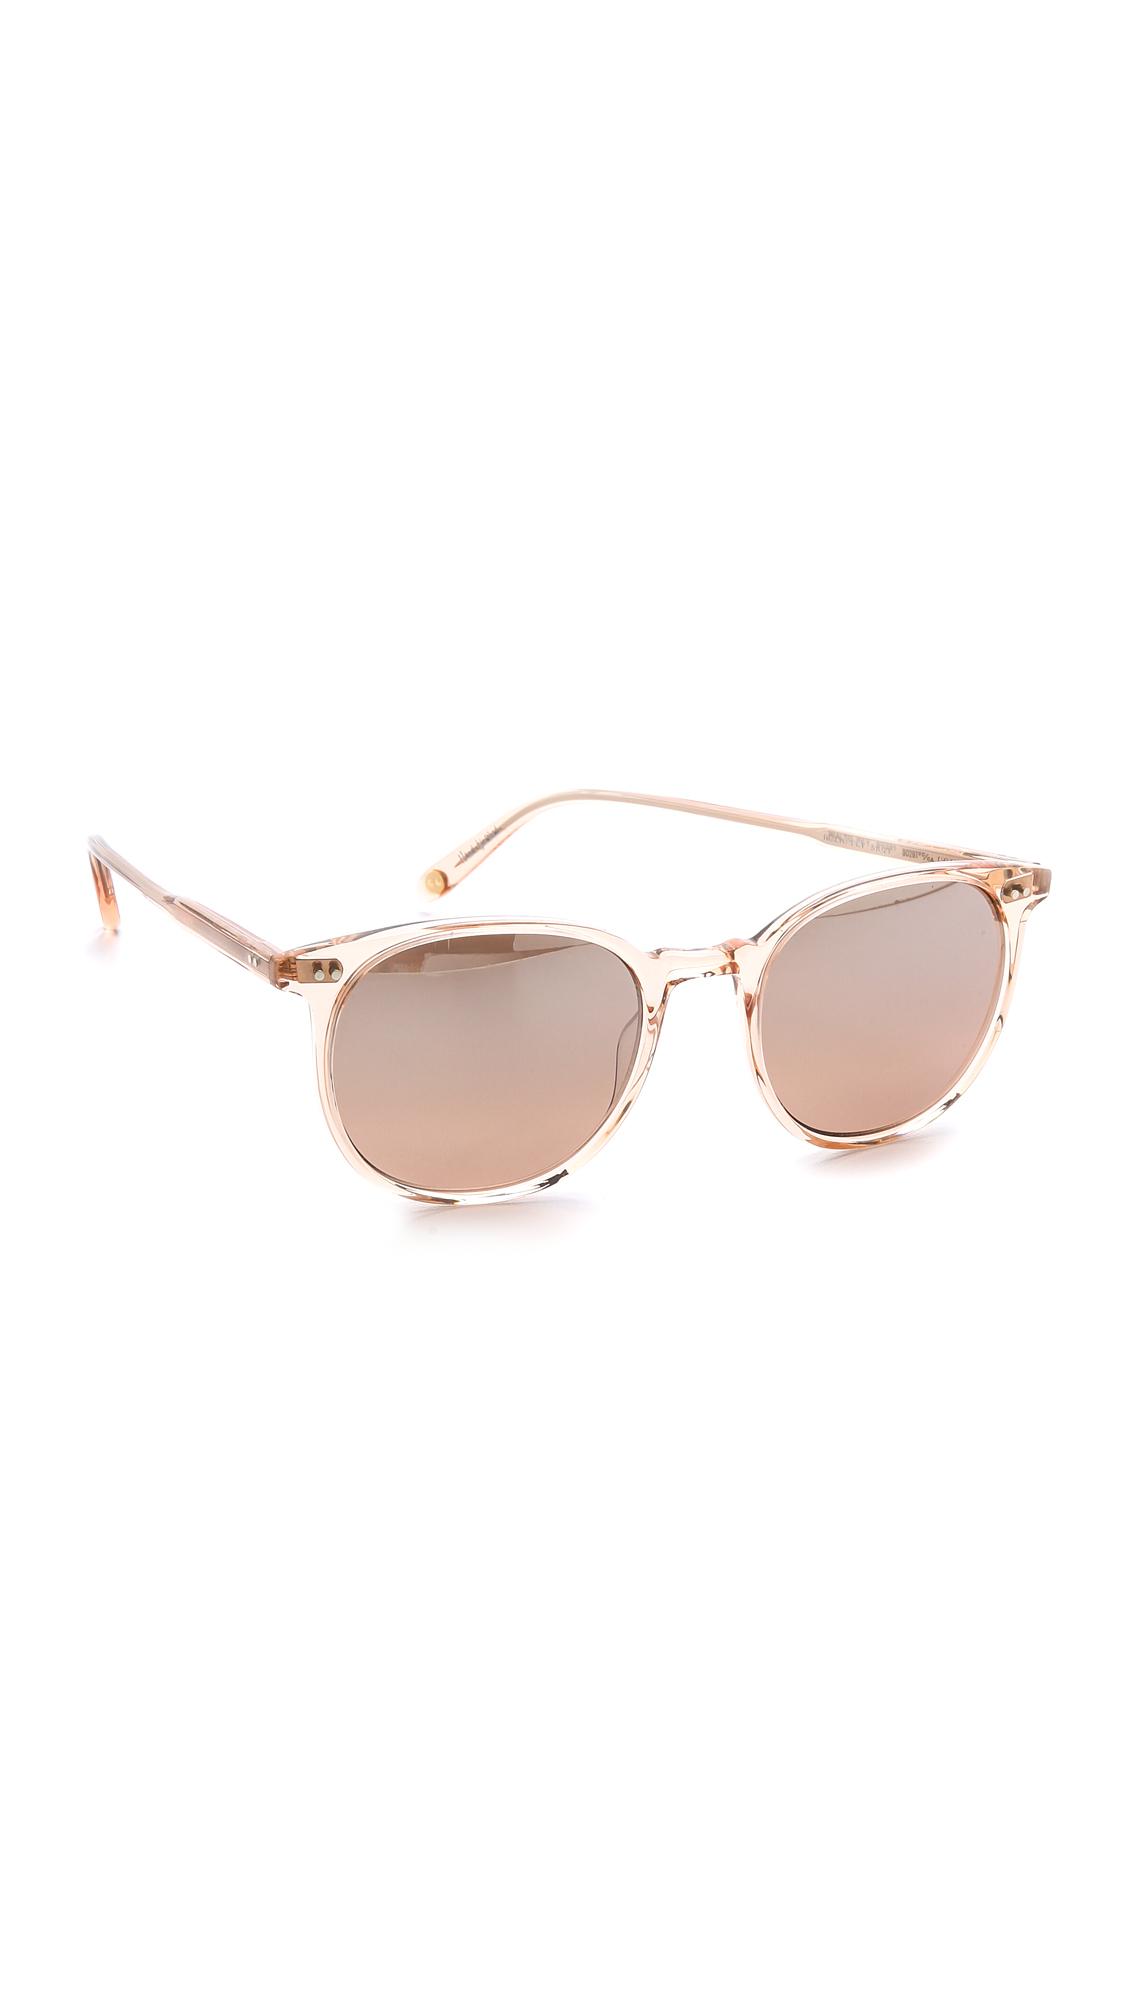 Lyst Garrett Leight Rialto Mirrored Sunglasses Pink